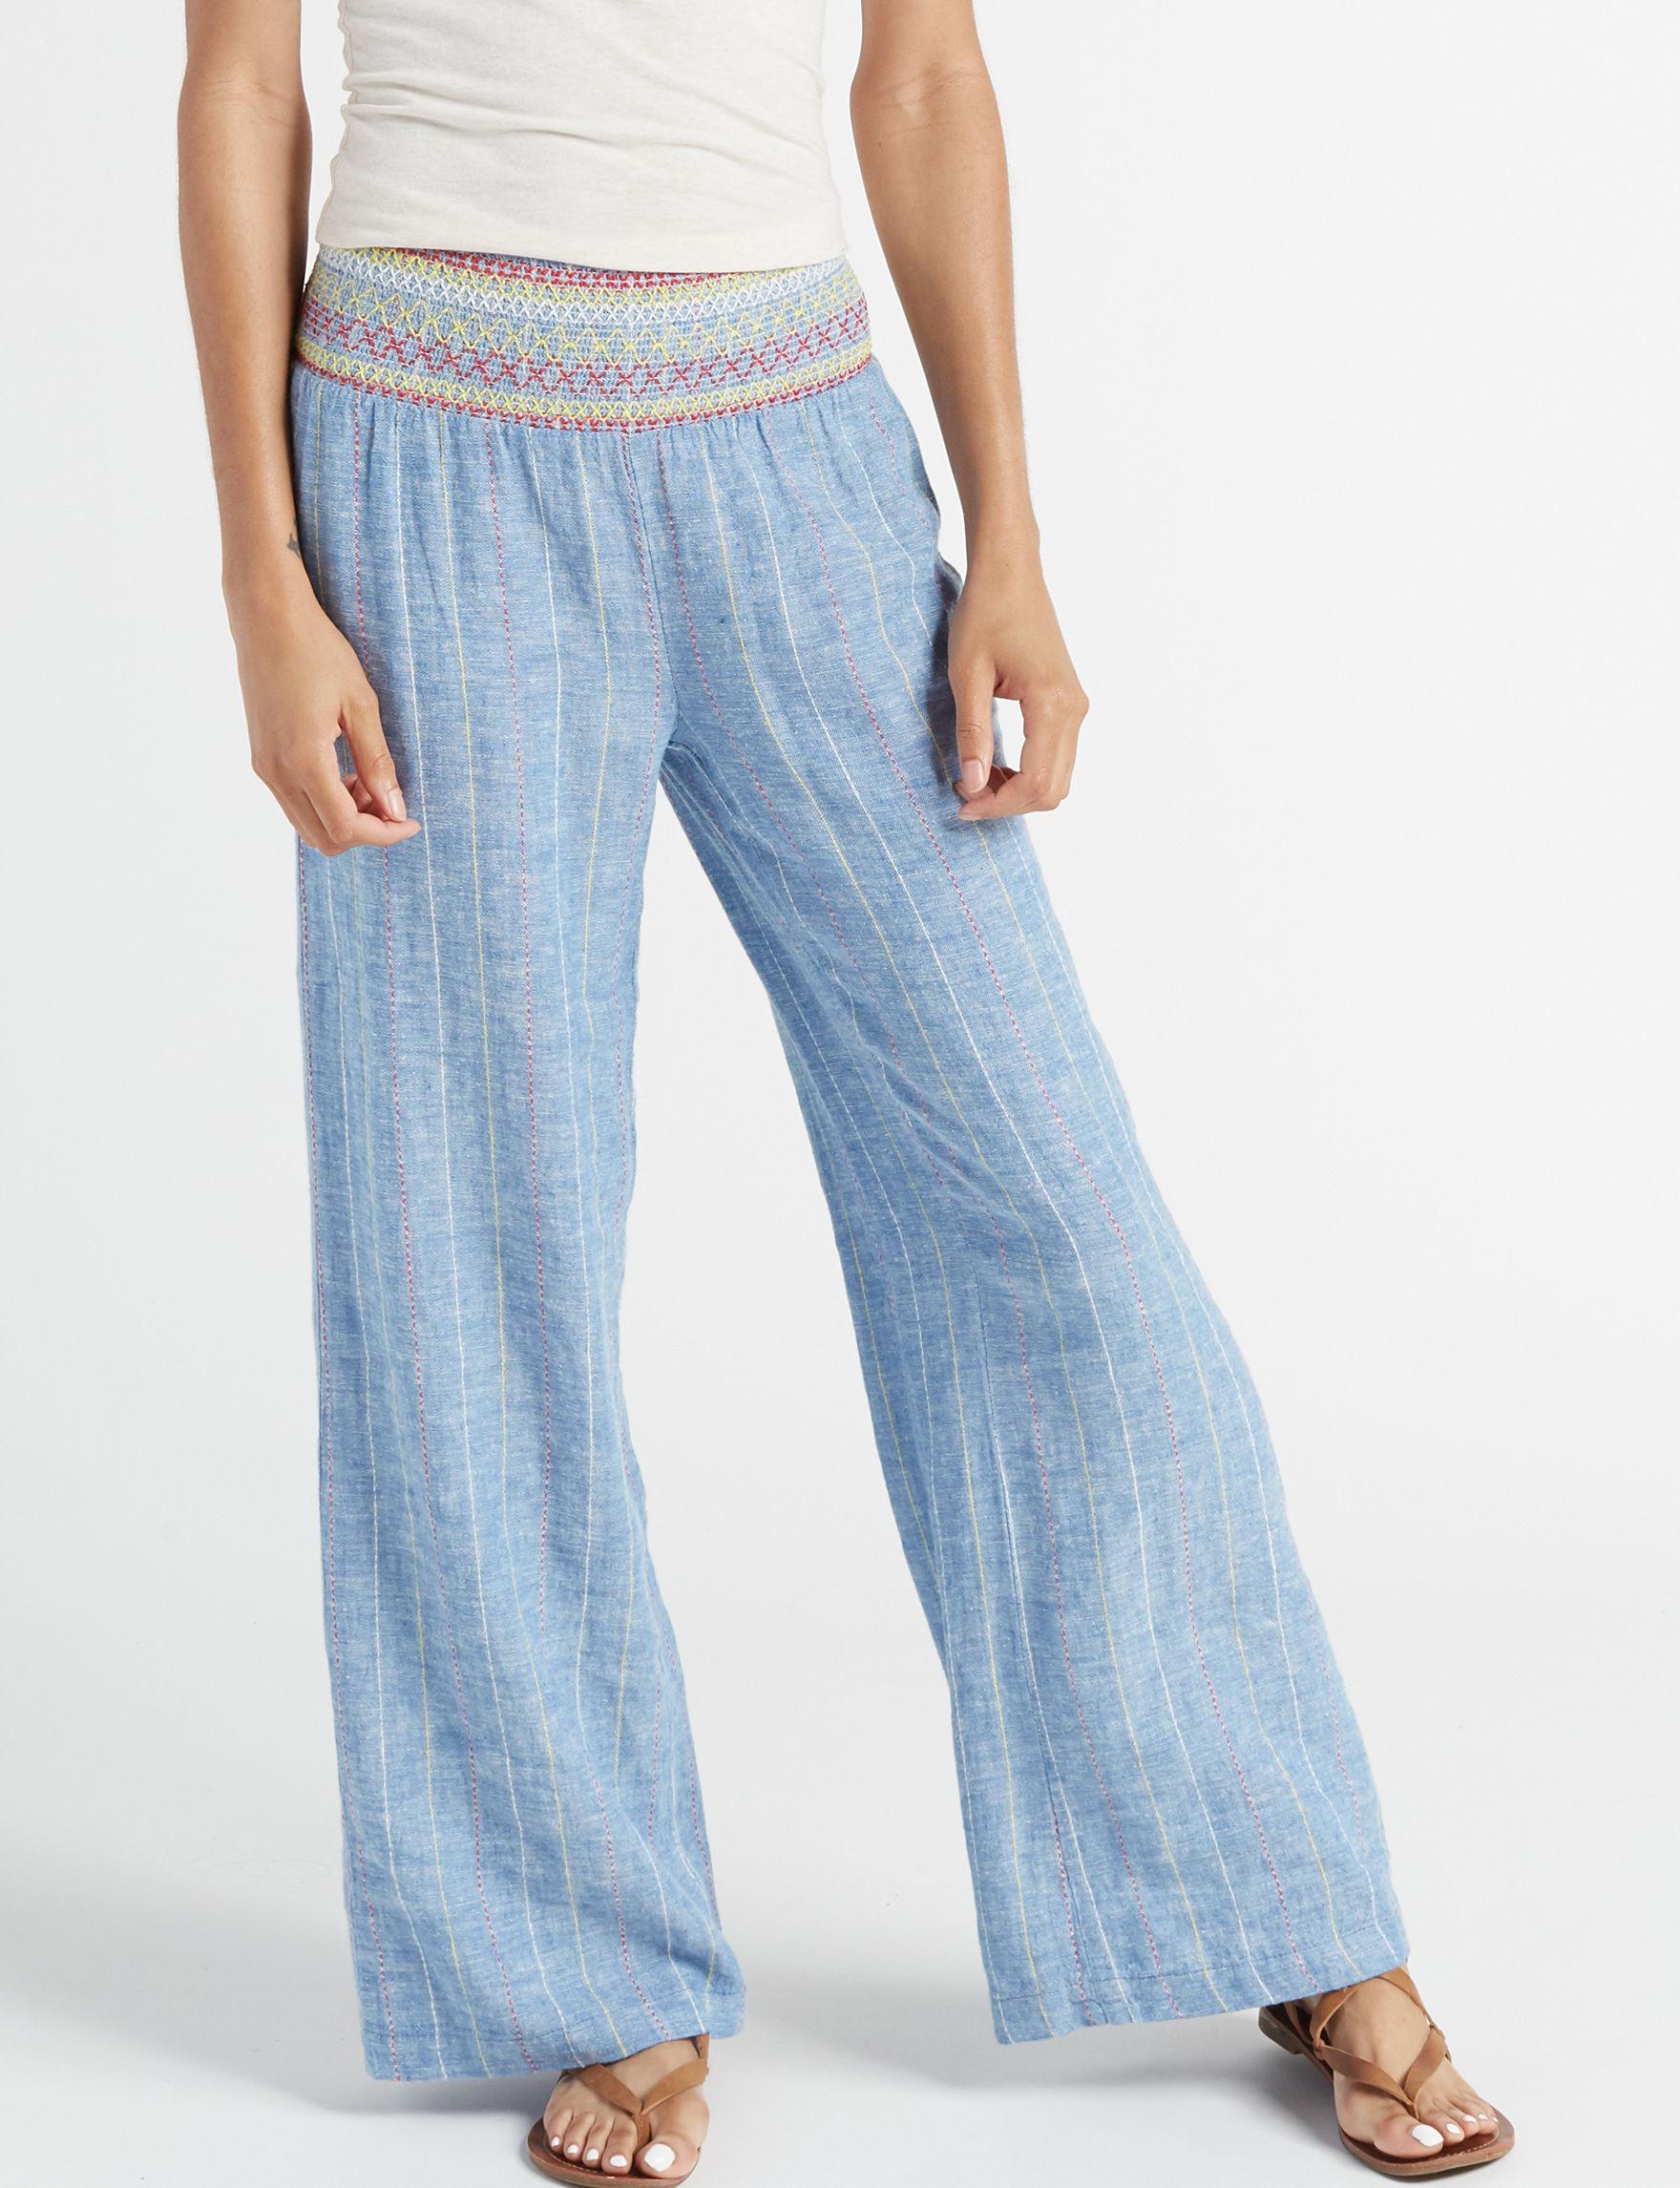 Indigo Rein Medium Blue Soft Pants